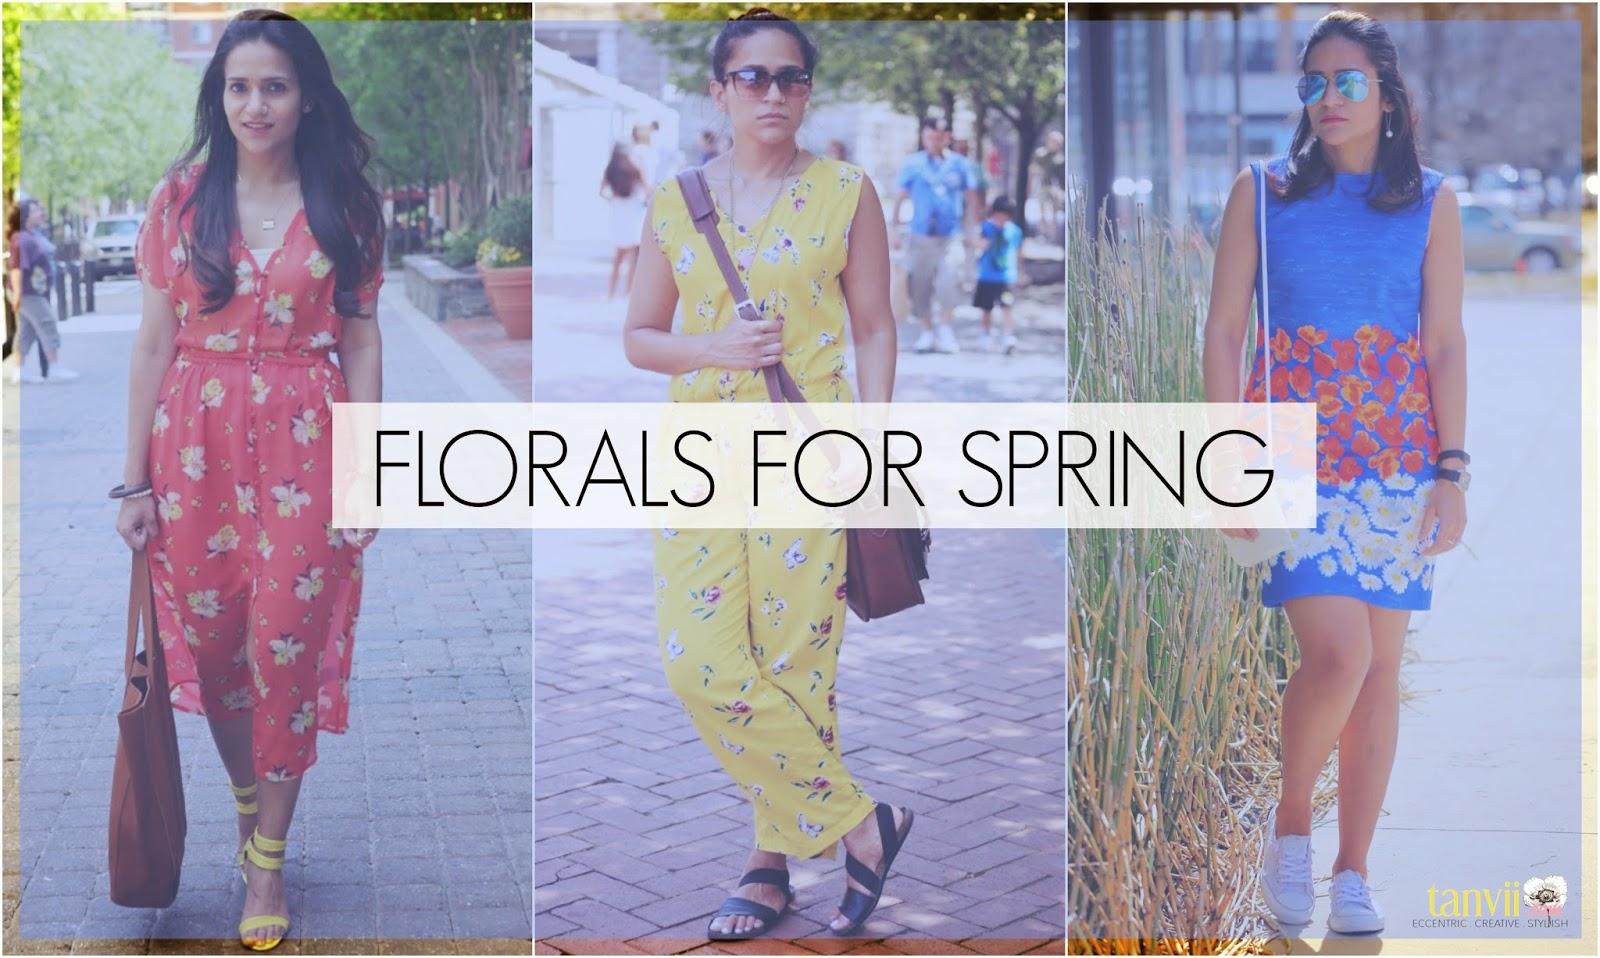 Florals For Spring, Trend 2015, Tanvii.com